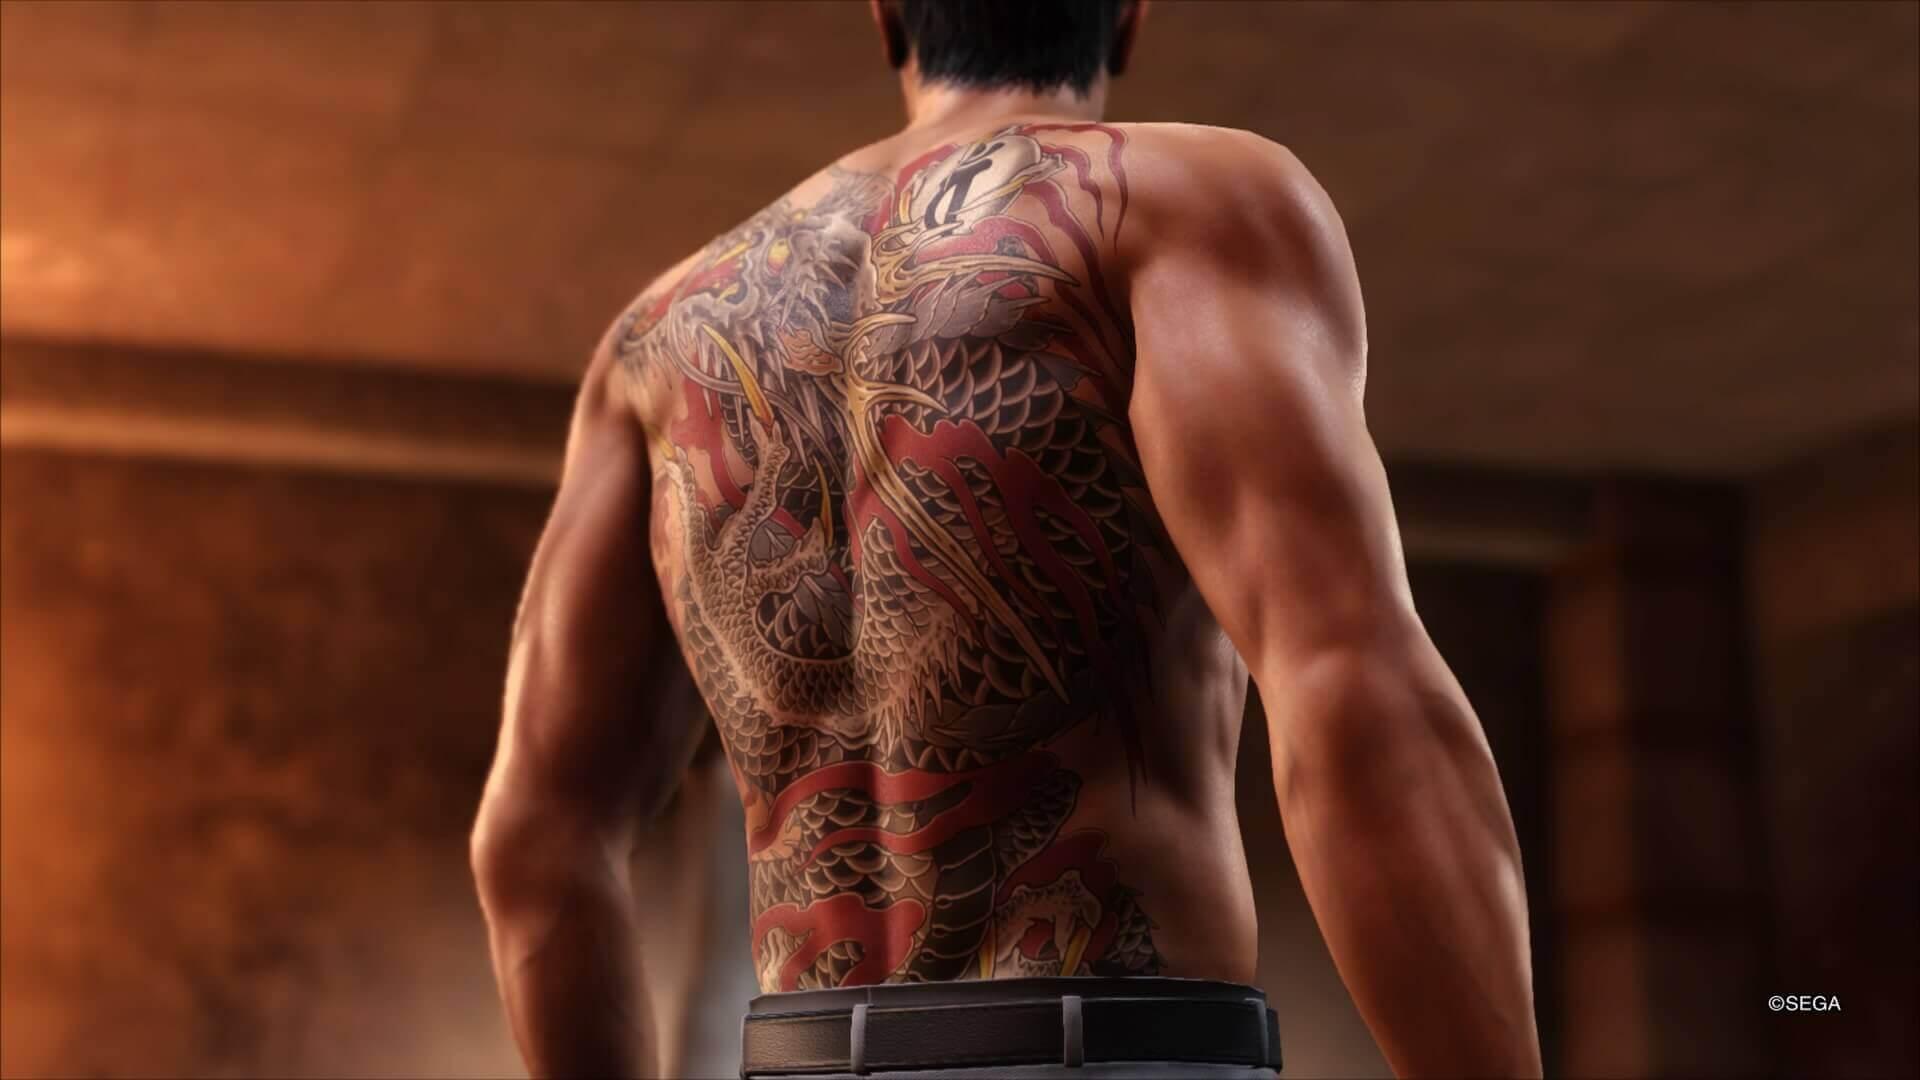 Kiryu Kazuma Tattoo: Análise: Yakuza 6 Finaliza A História De Kazuma Kiryu De